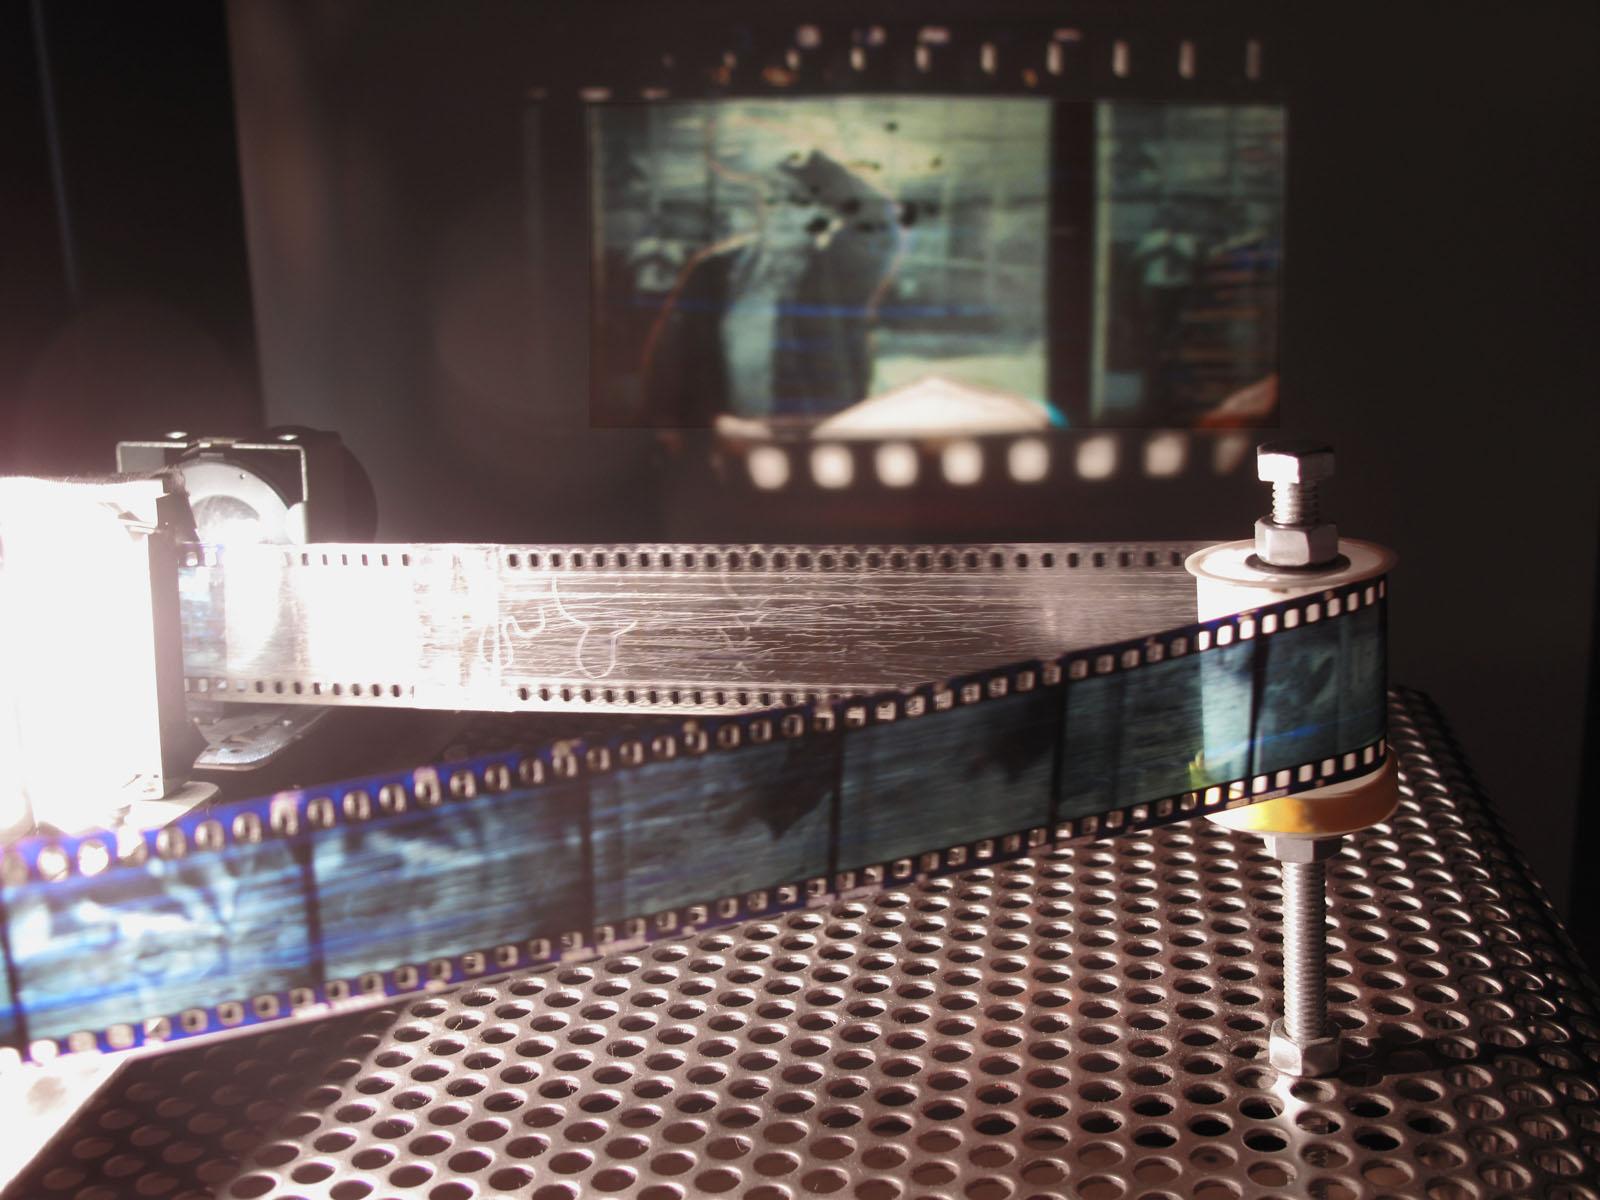 projector1.jpg